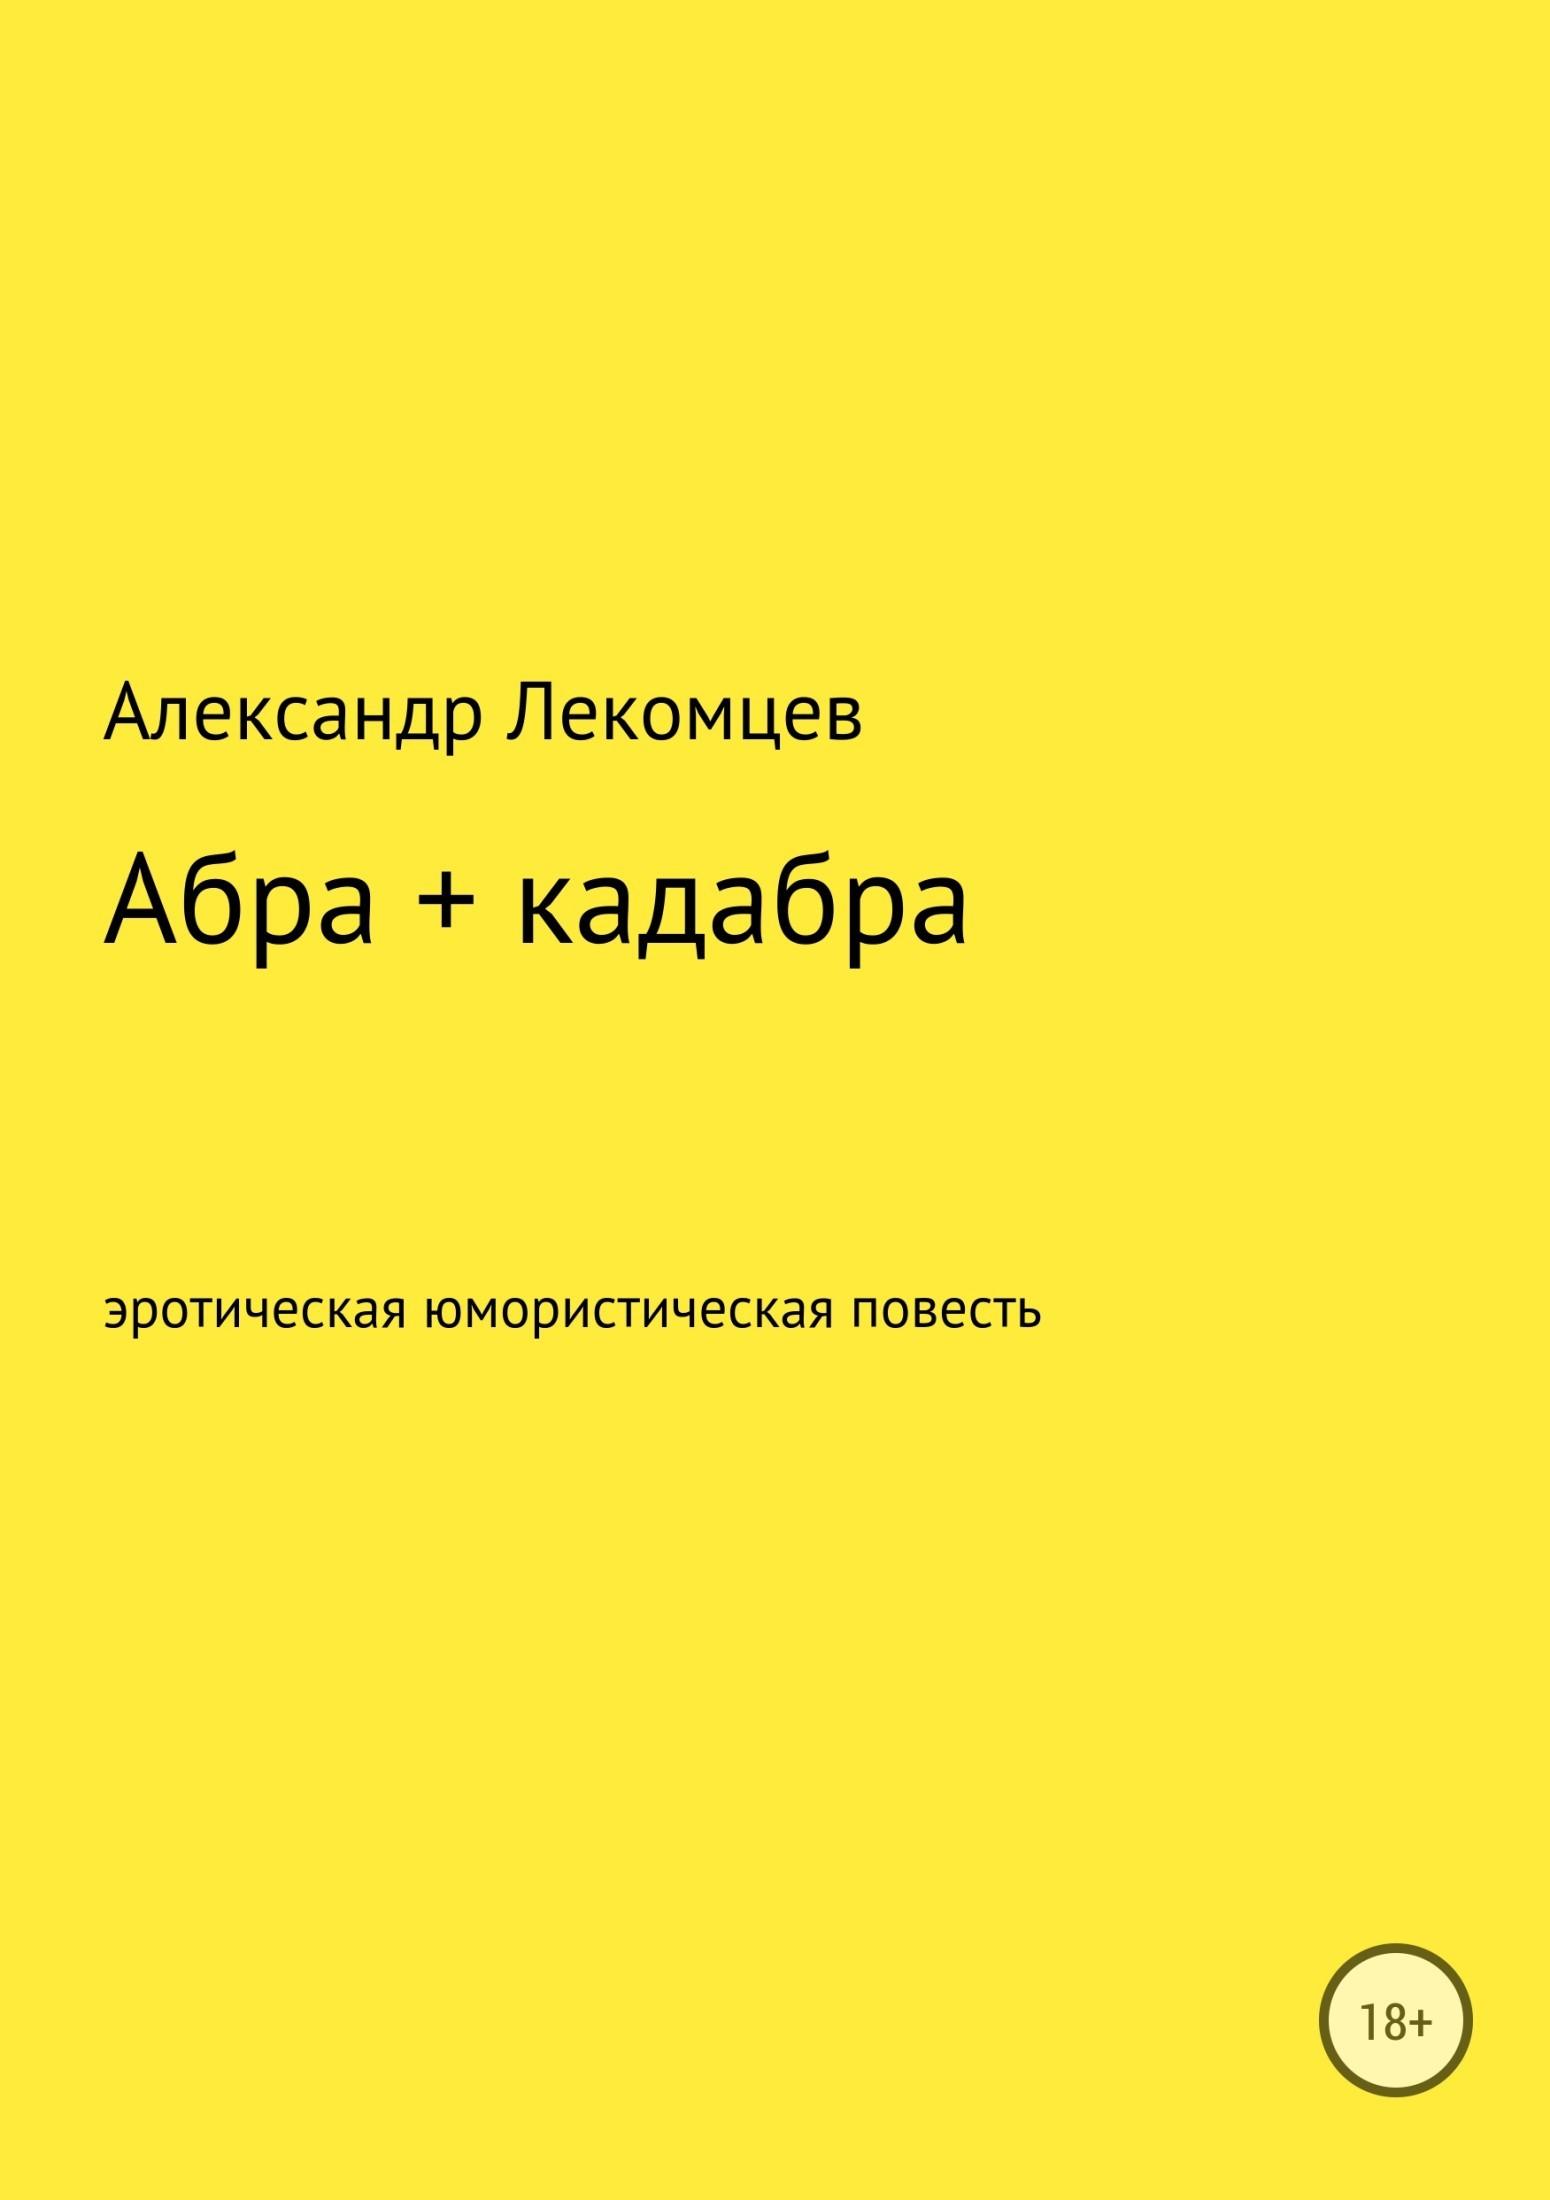 Александр Лекомцев - Абра + кадабра